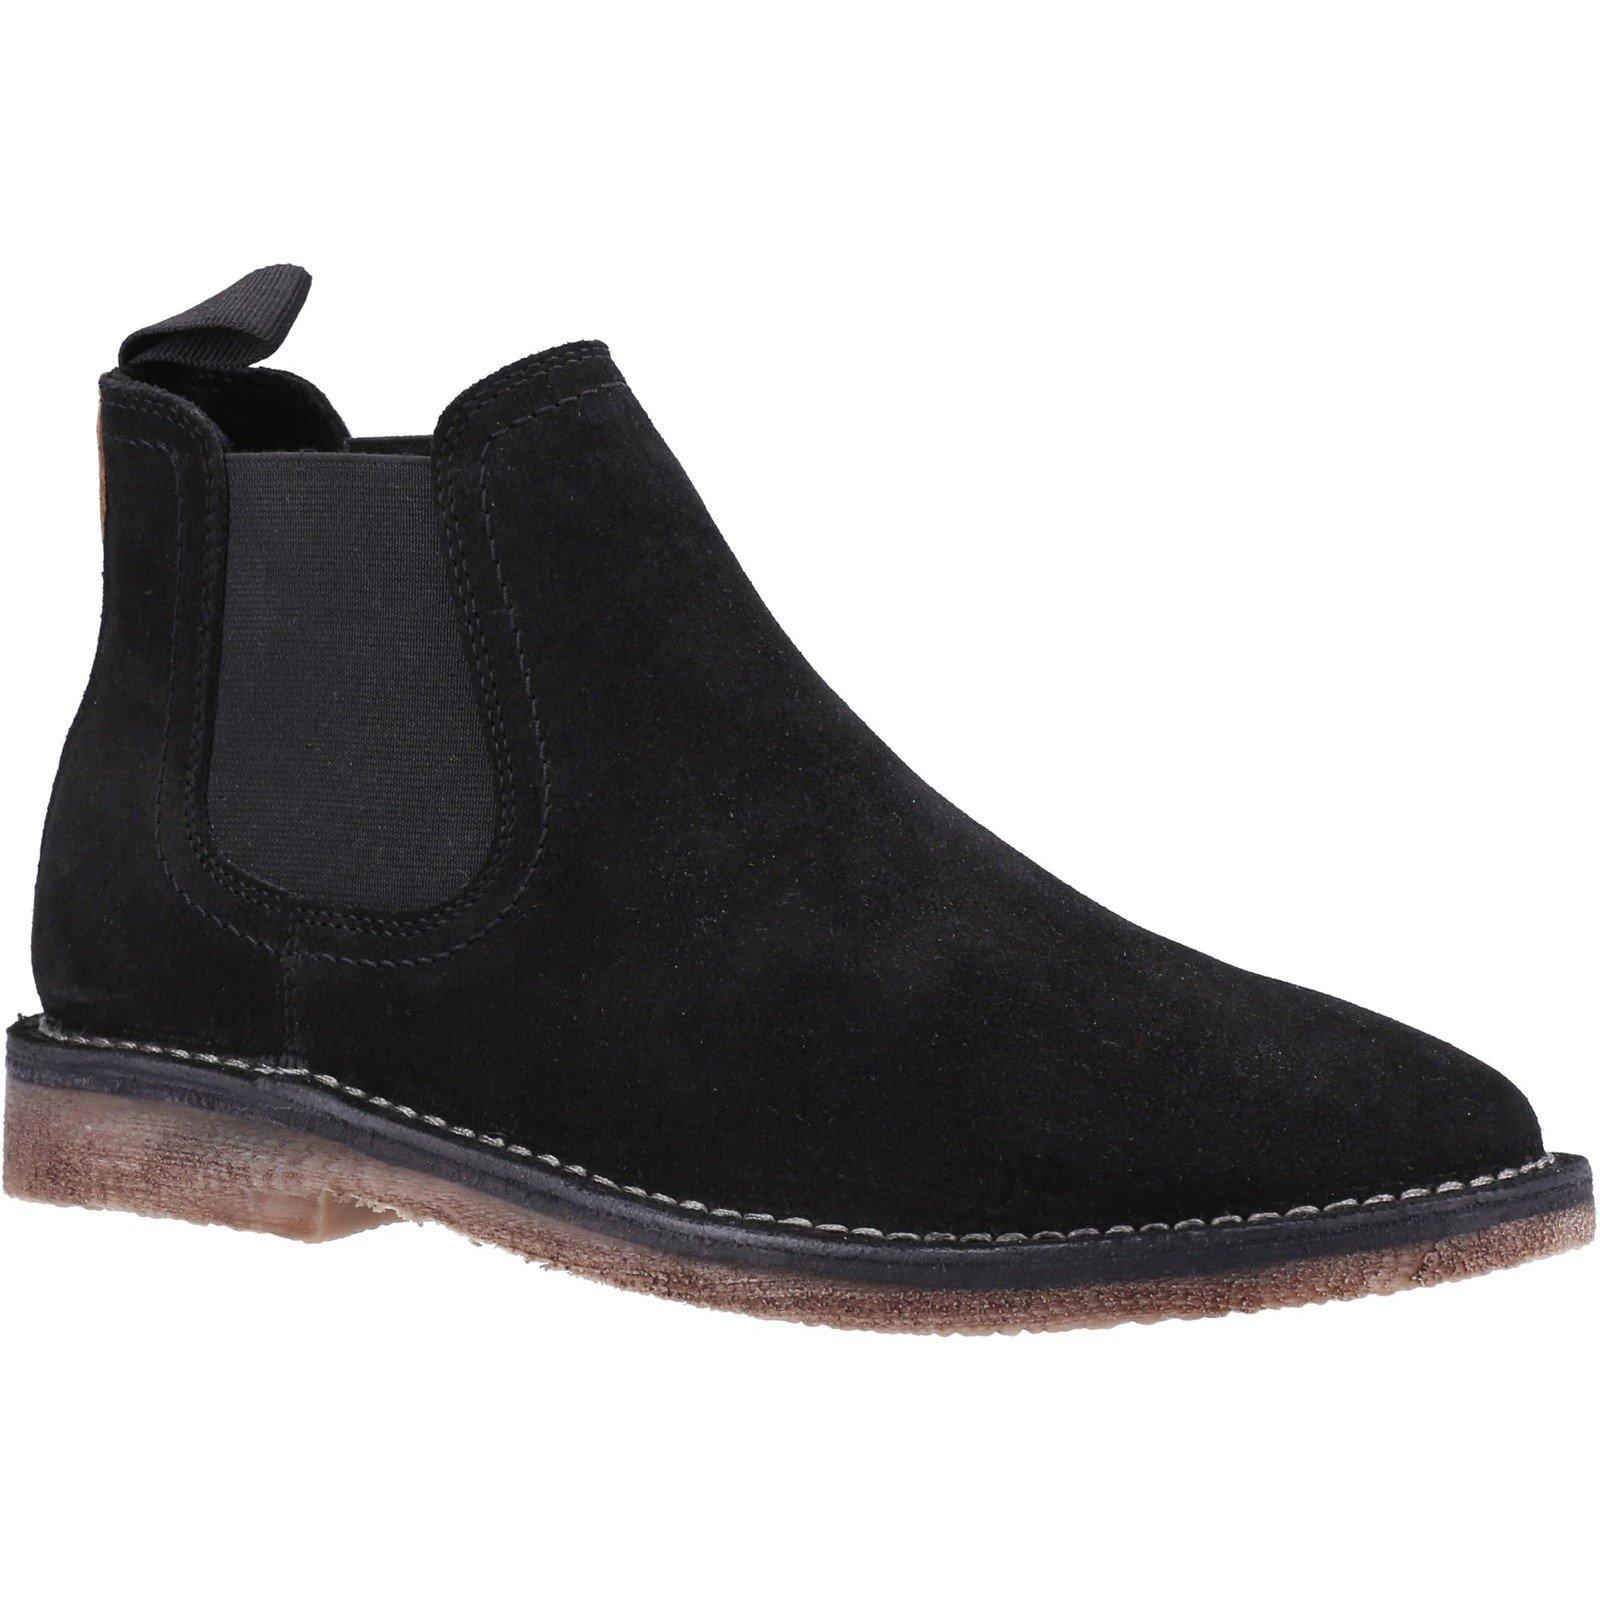 Hush Puppies Men's Shaun Leather Chelsea Boot Various Colours 32897 - Black 9